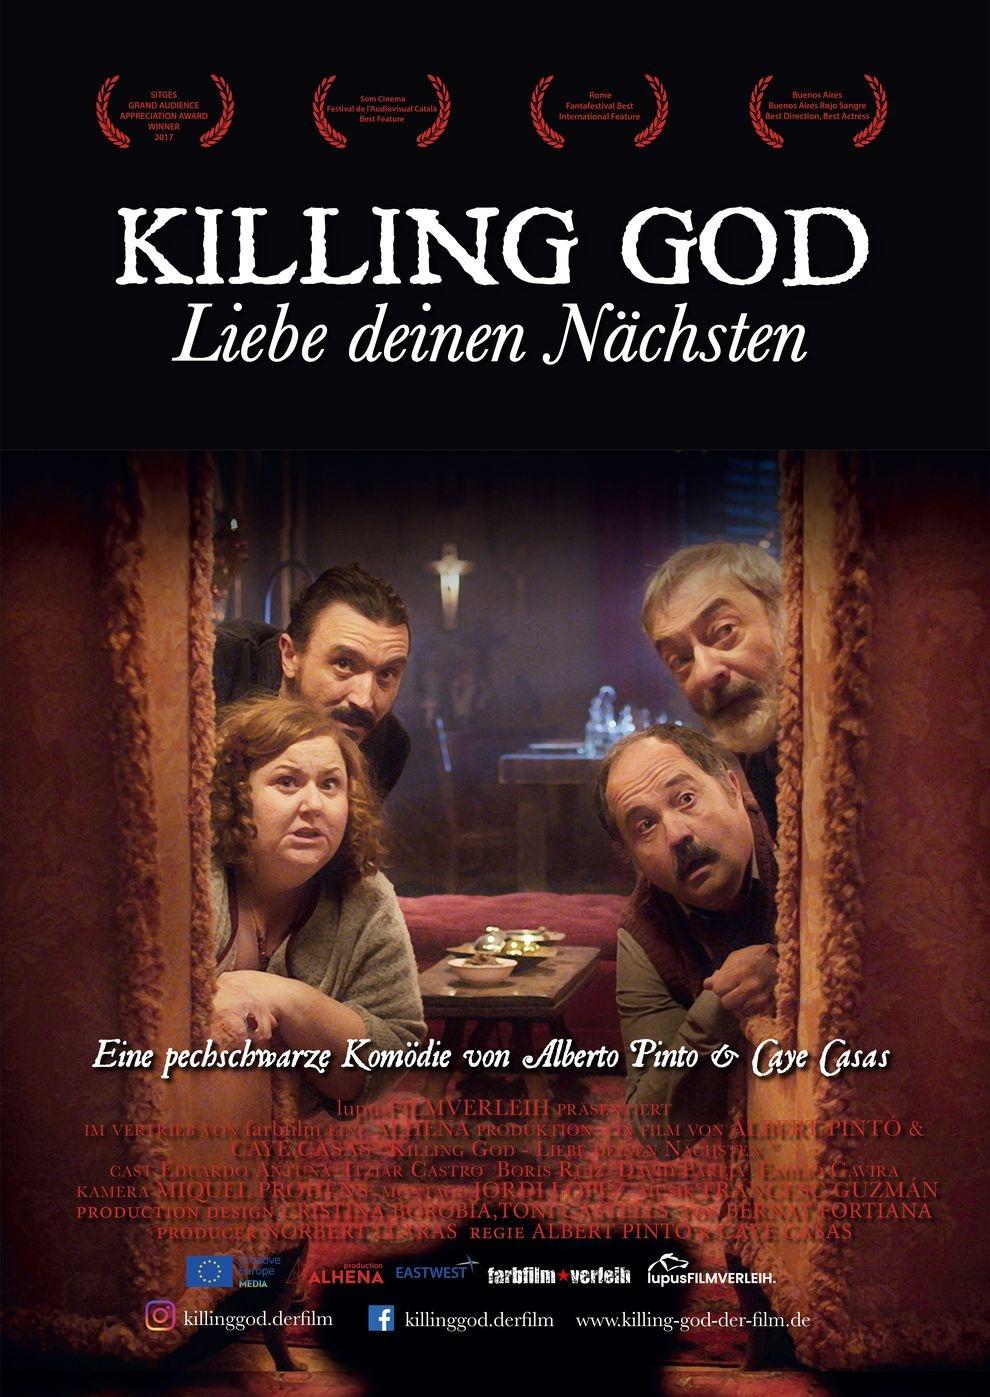 Killing God - Liebe Deinen Nächsten (Poster)